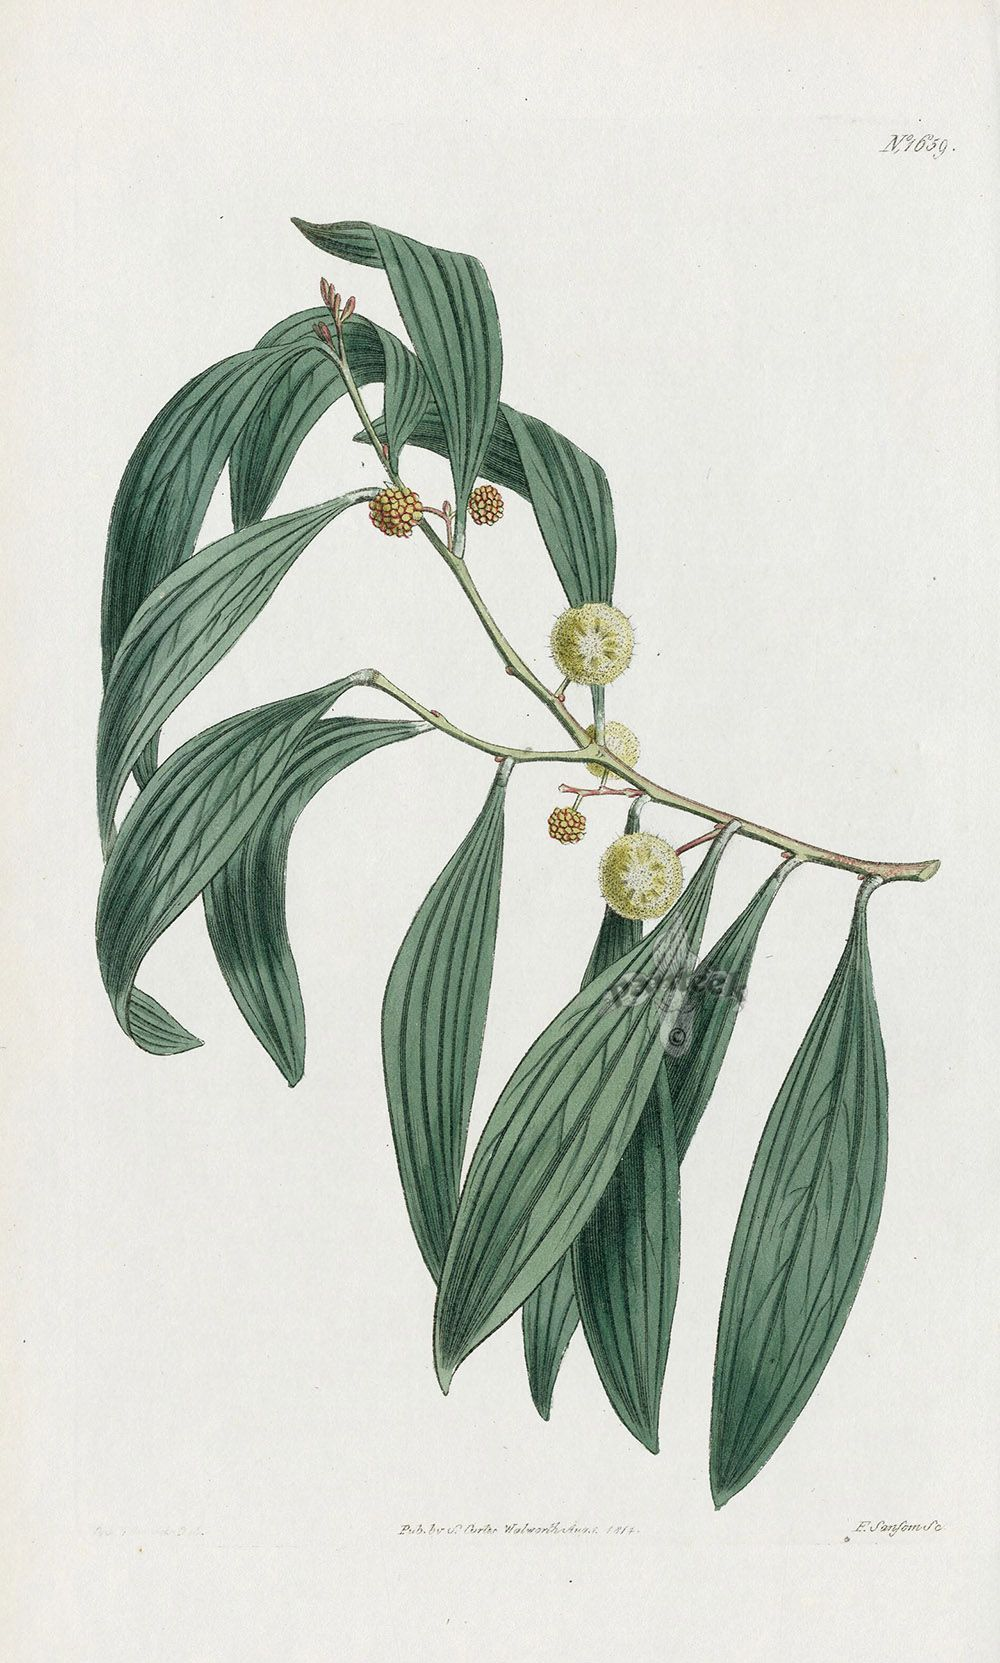 Acacia Melanoxylon from Historical botanical drawings of Australian plants